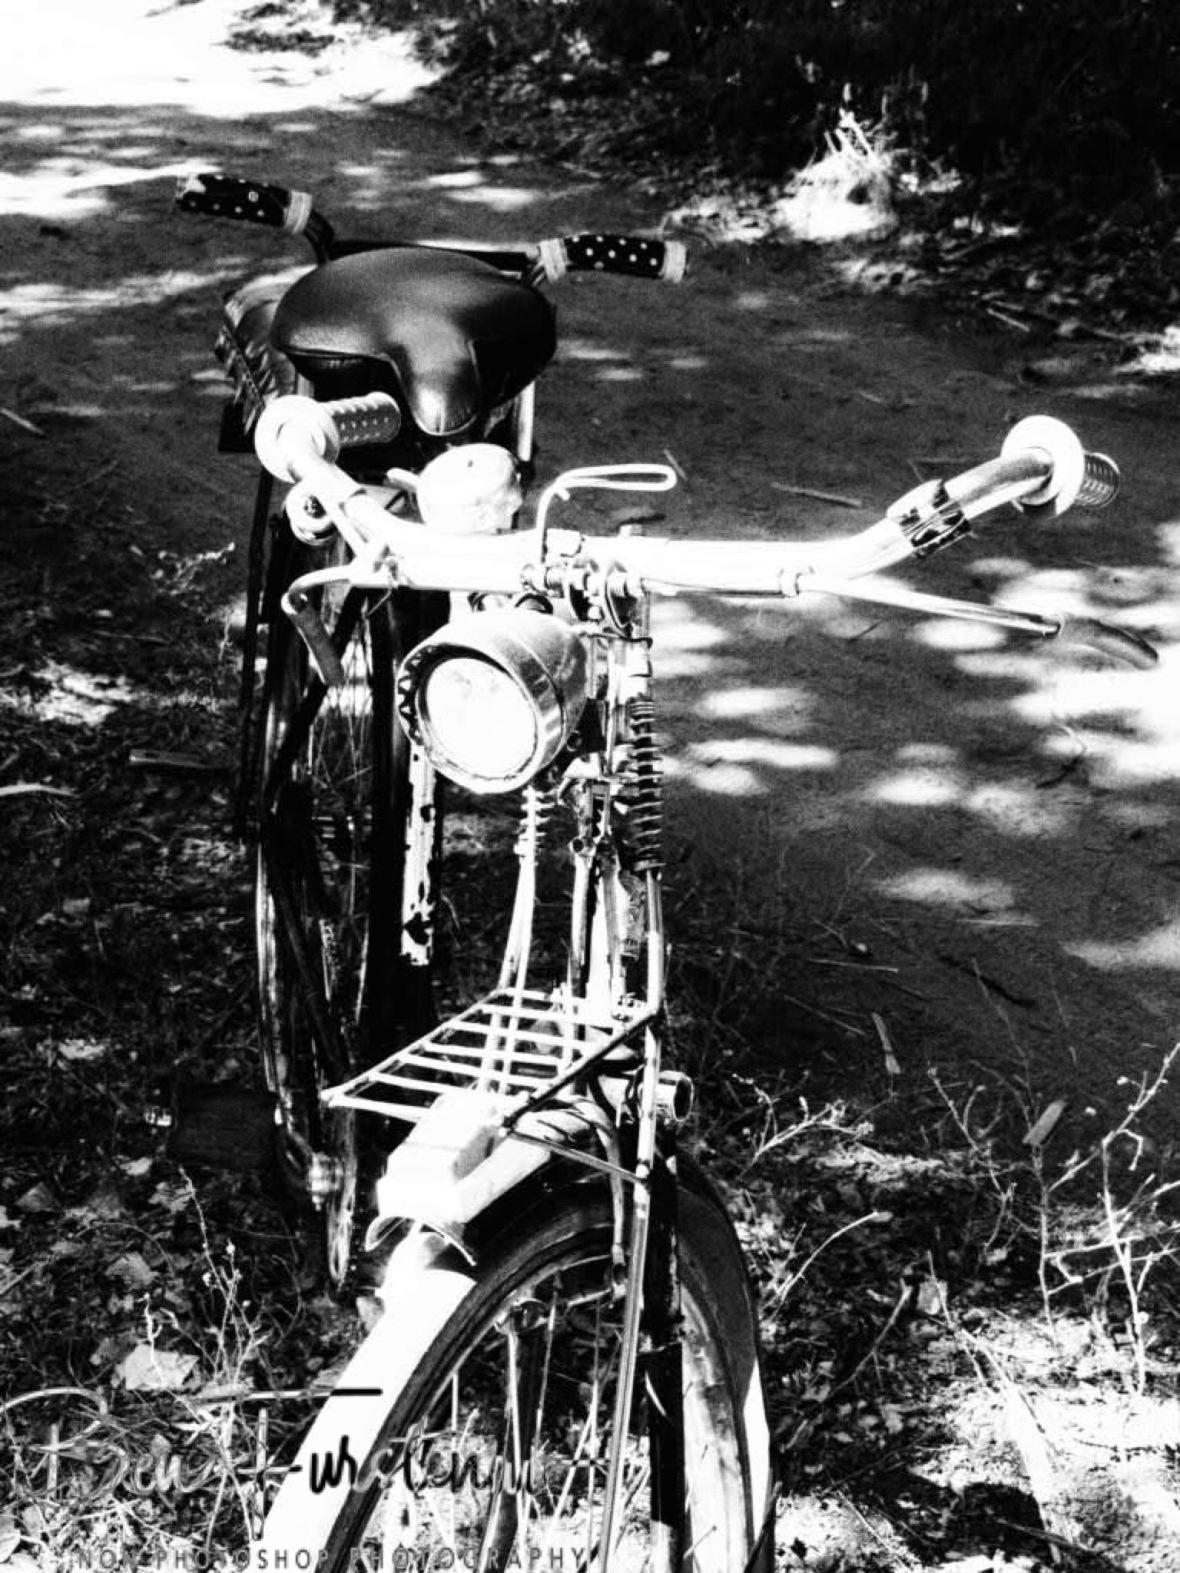 Classic bike taxi in Monkey Bay, Lake Malawi, Malawi